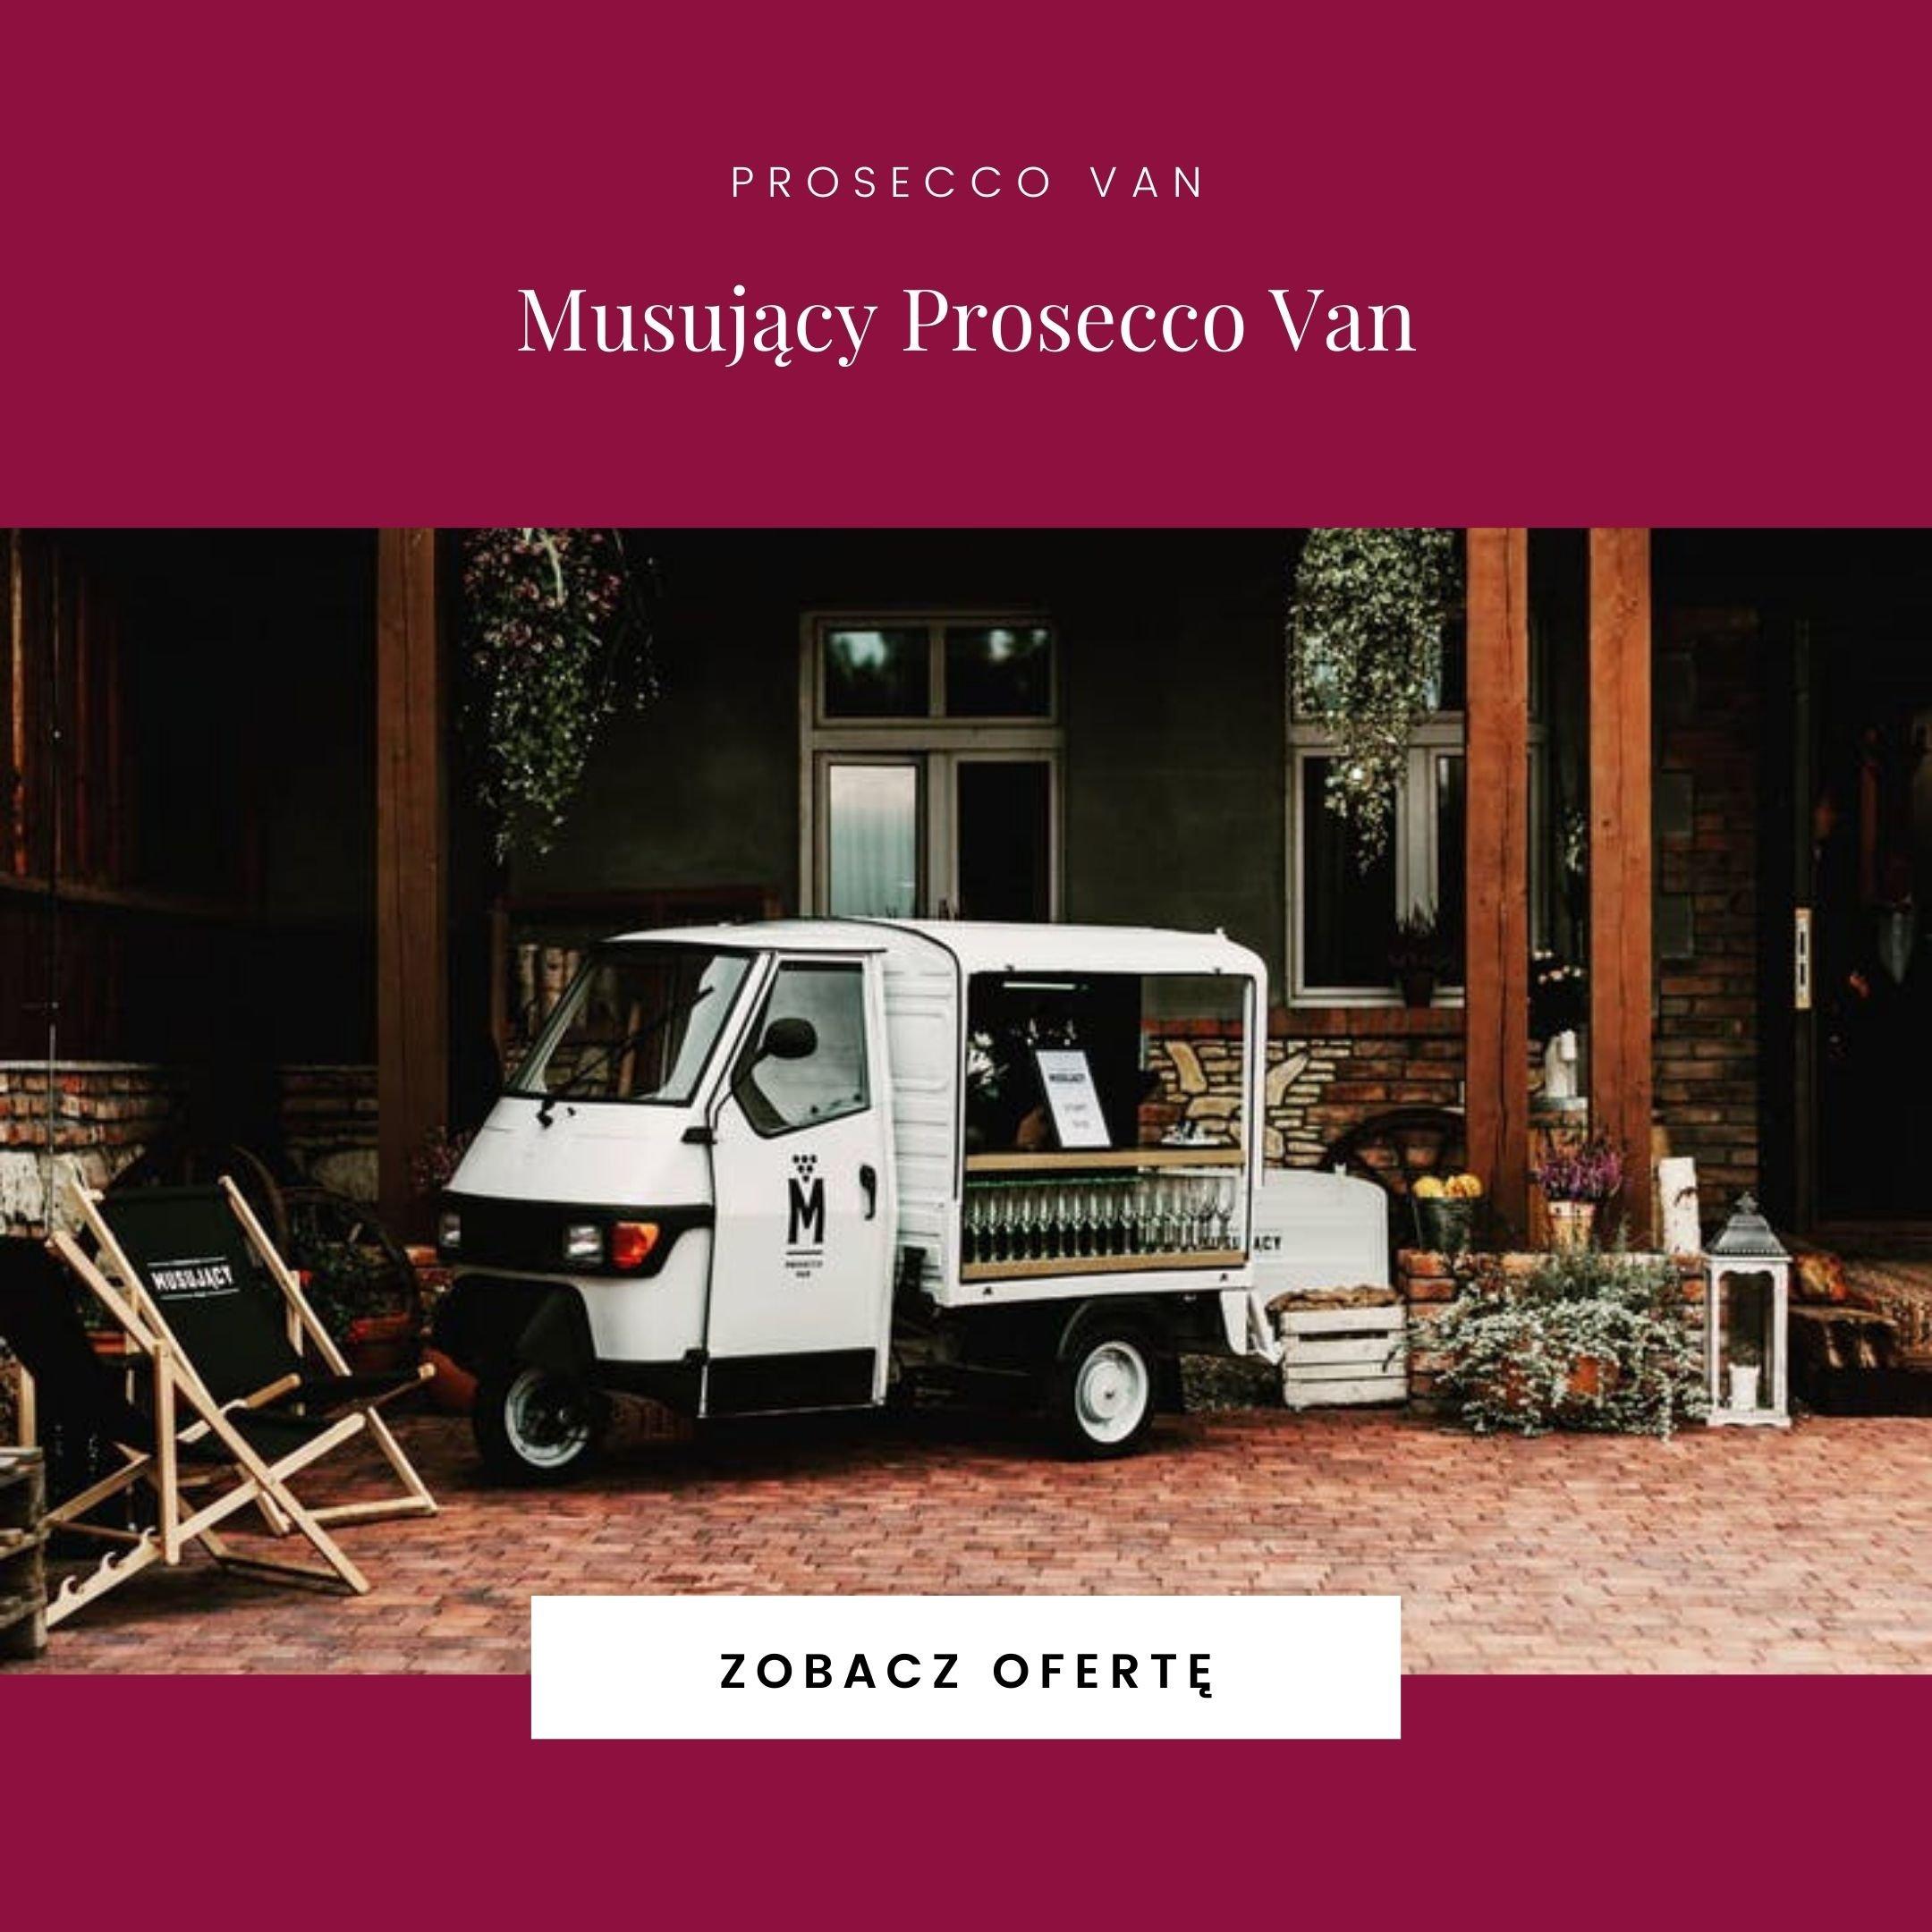 Musujący Prosecco Van